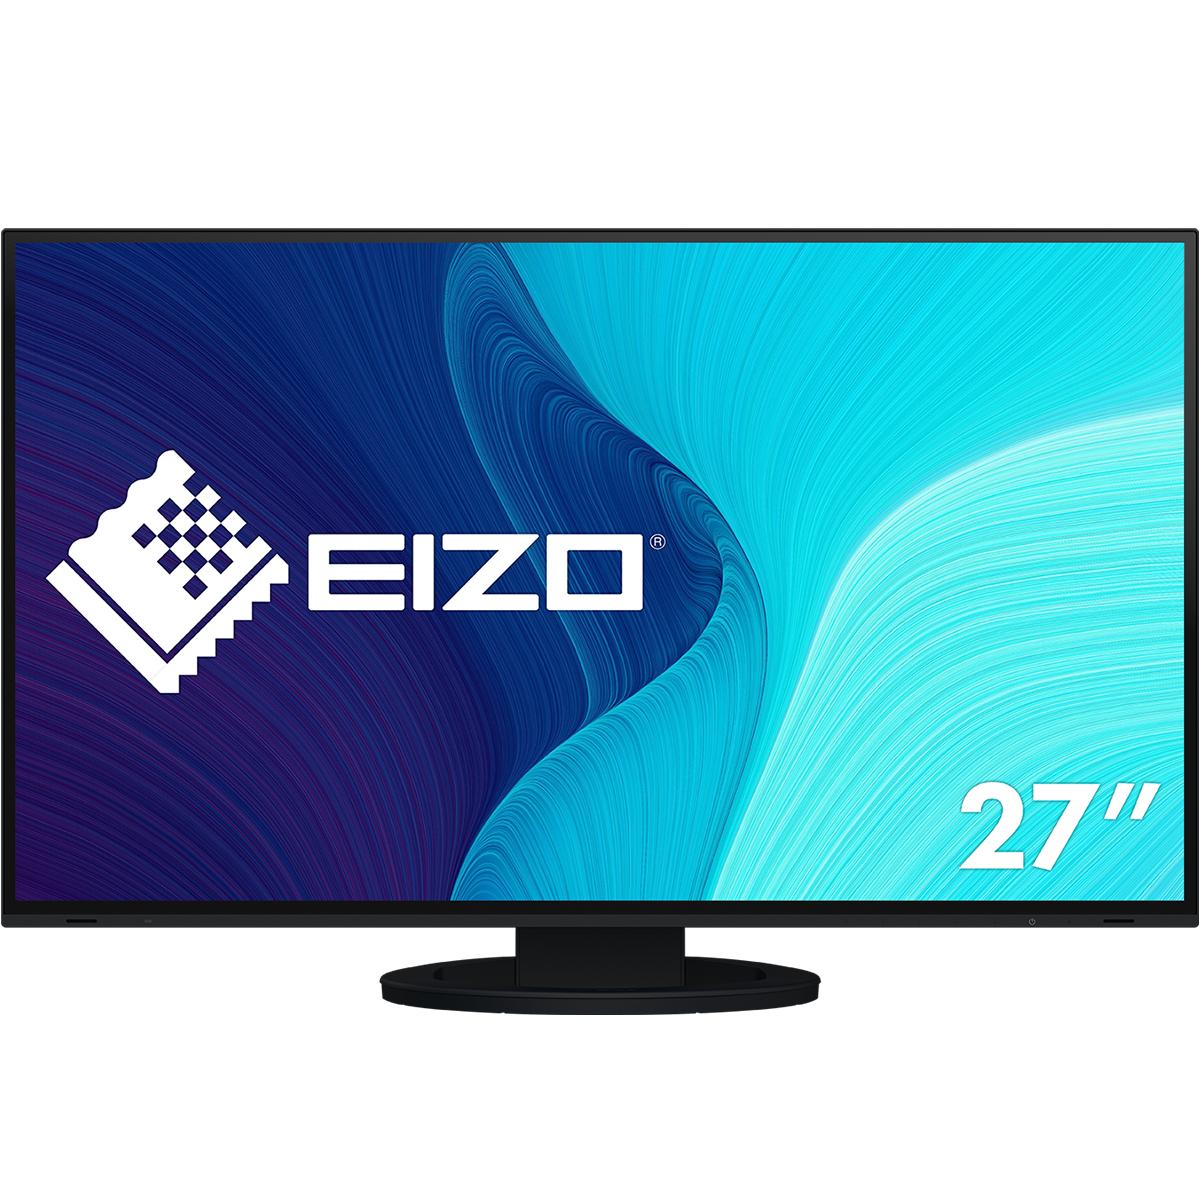 EIZO FlexScan EV2795-BK computer monitor 68.6 cm (27